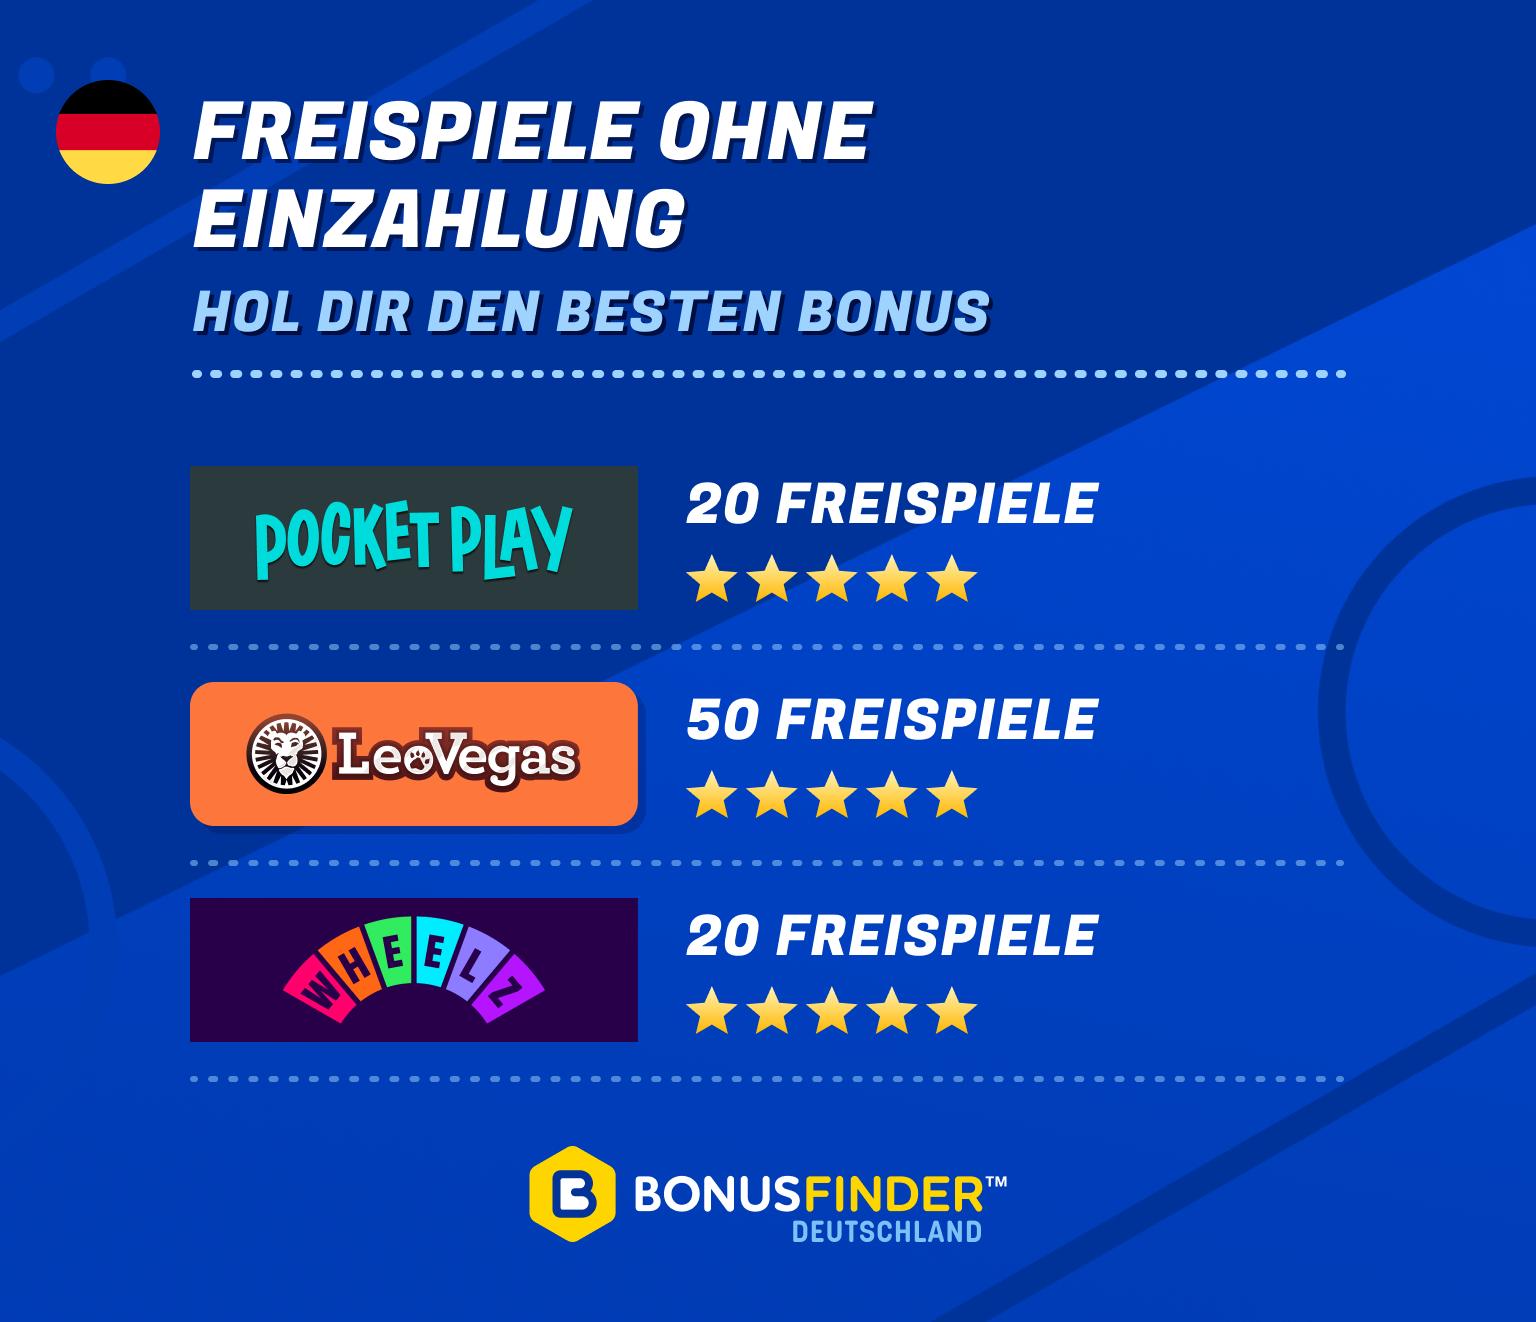 10 euro bonus ohne einzahlung casino freispiele